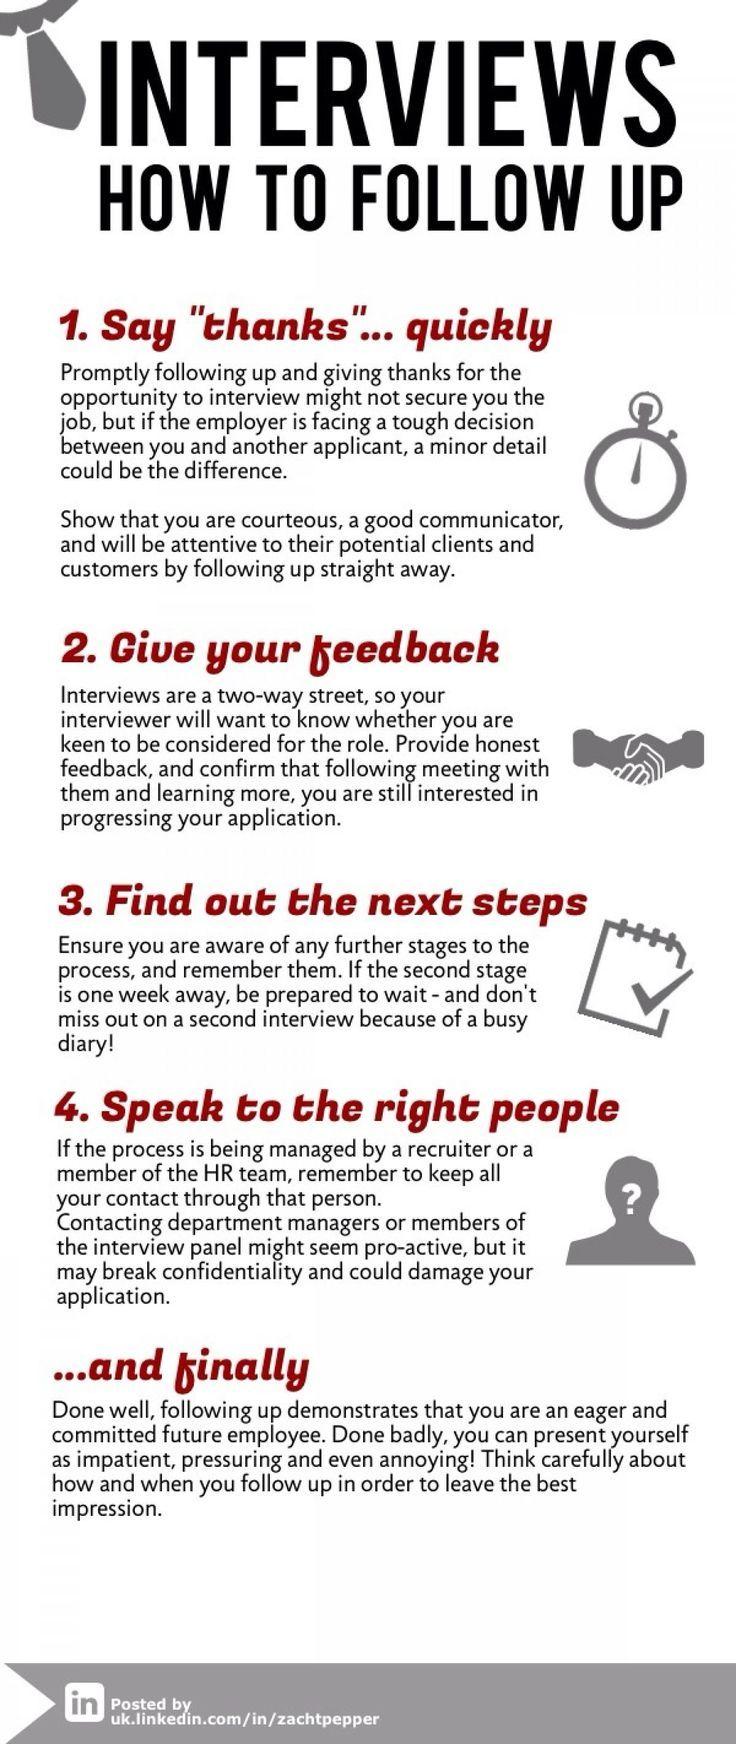 job interviews - Employer Interview Tips Techniques Guide